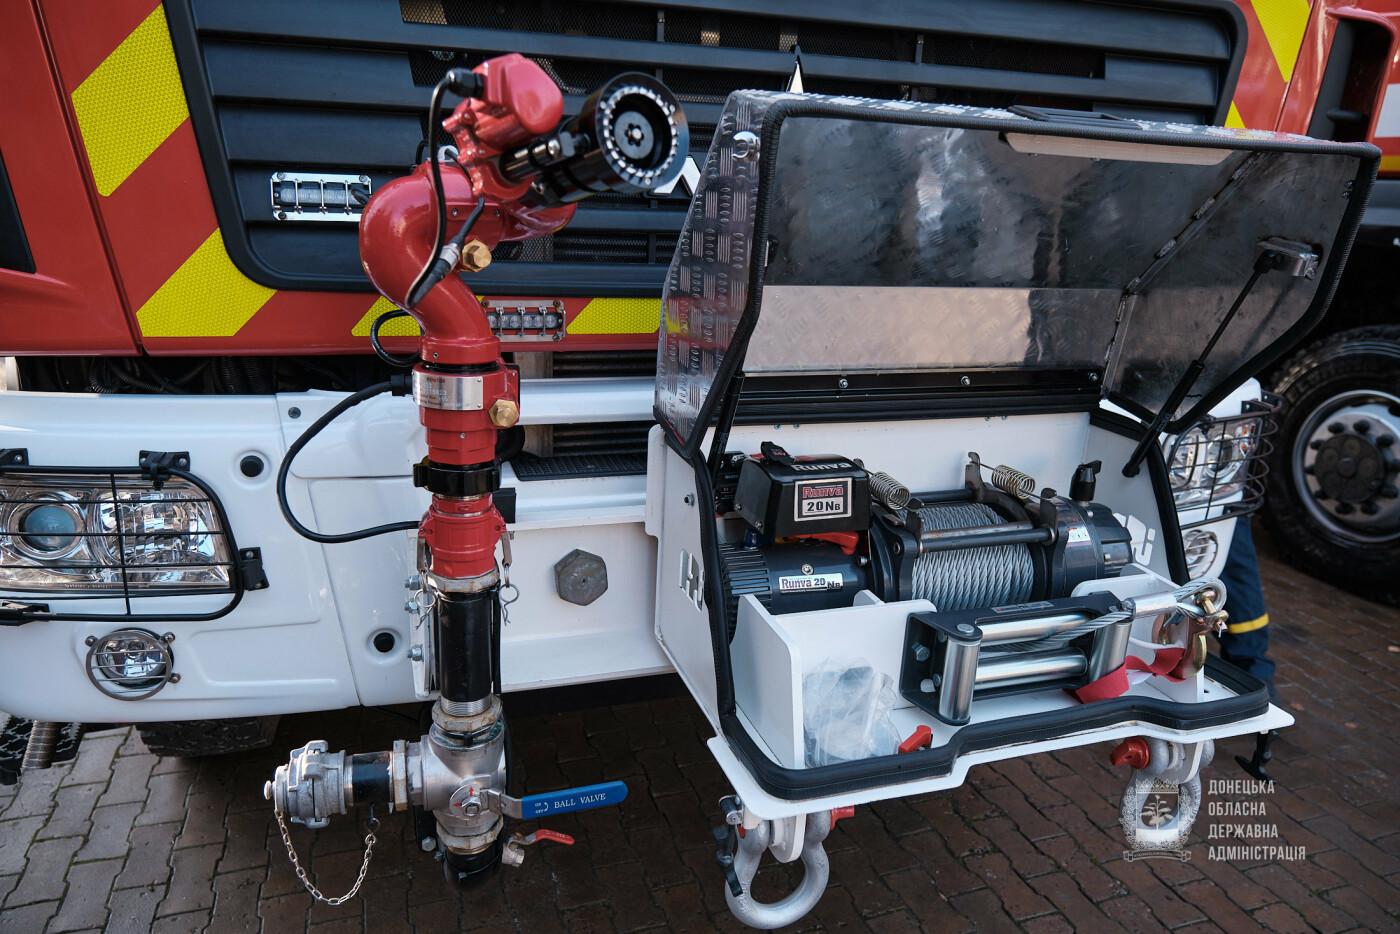 Слов'янські рятувальники отримали нову пожежну автоцистерну, фото-2